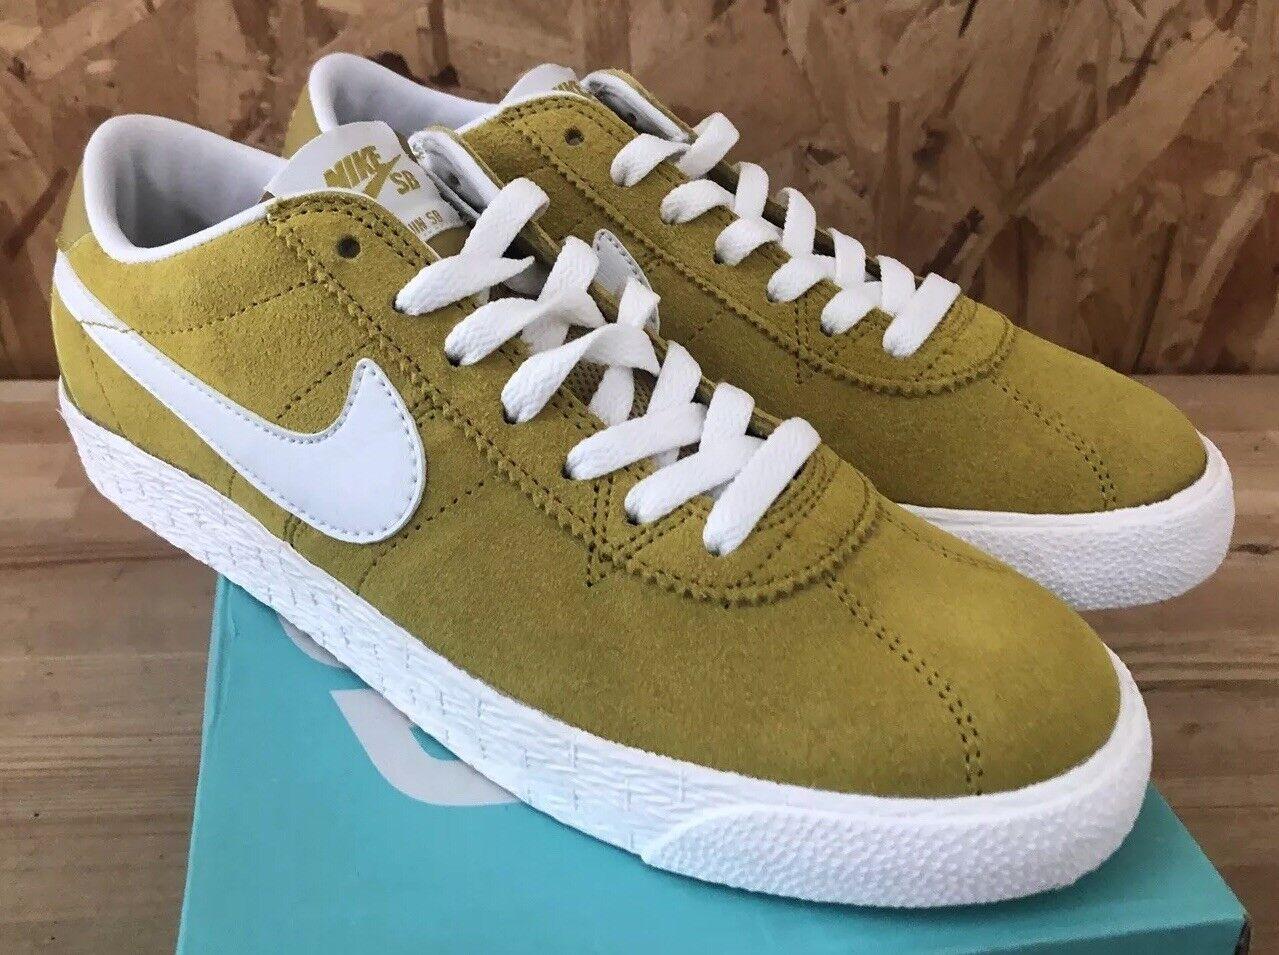 Nike Bruin SB Premium SE Peat Moss Ivory Sz 6 NIB 631041-311